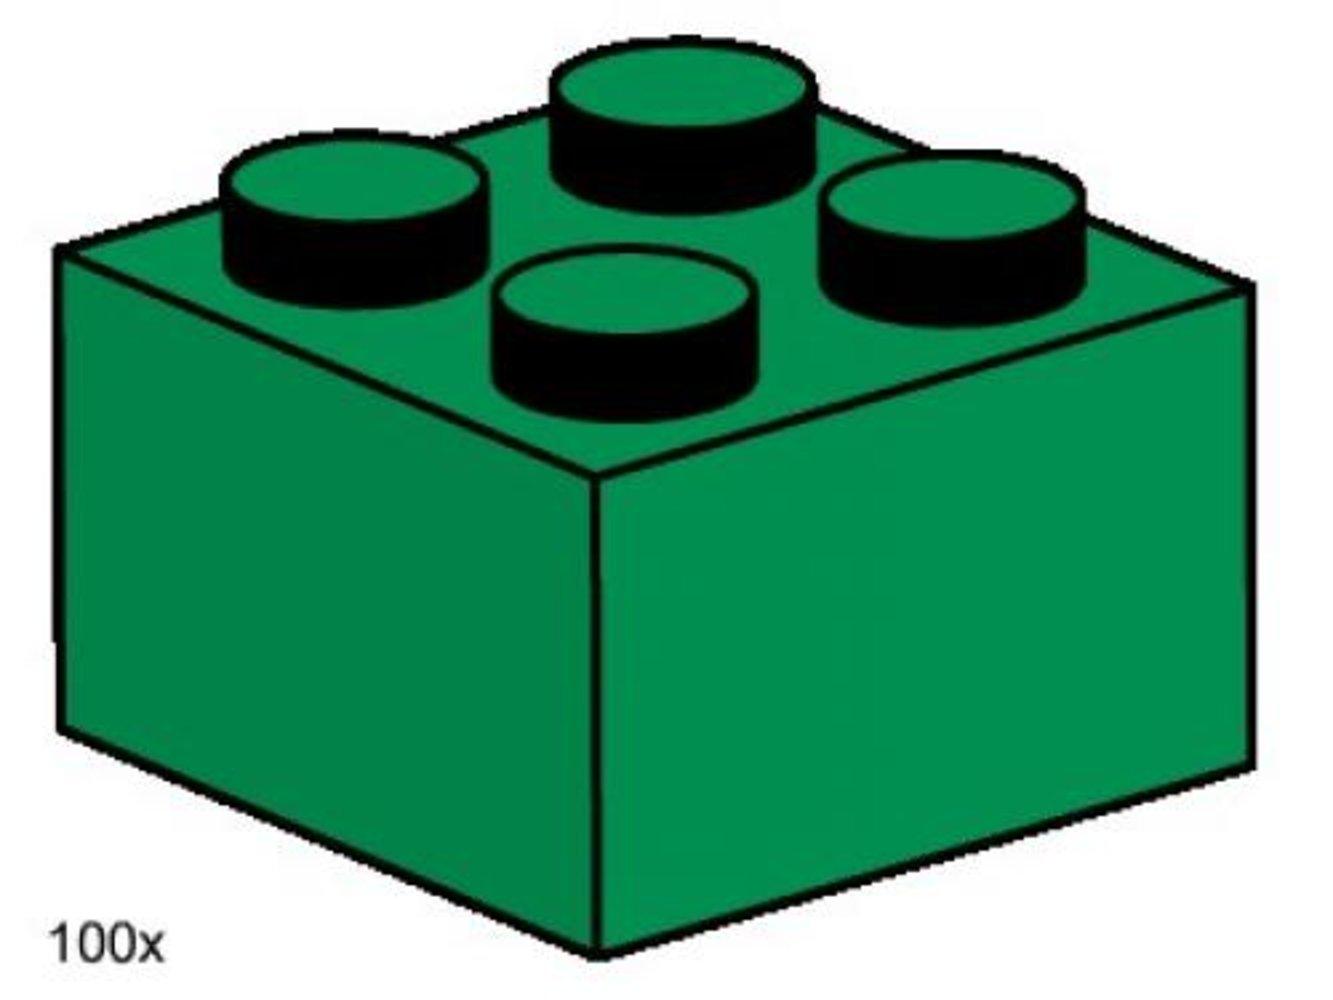 2 x 2 Dark Green Bricks